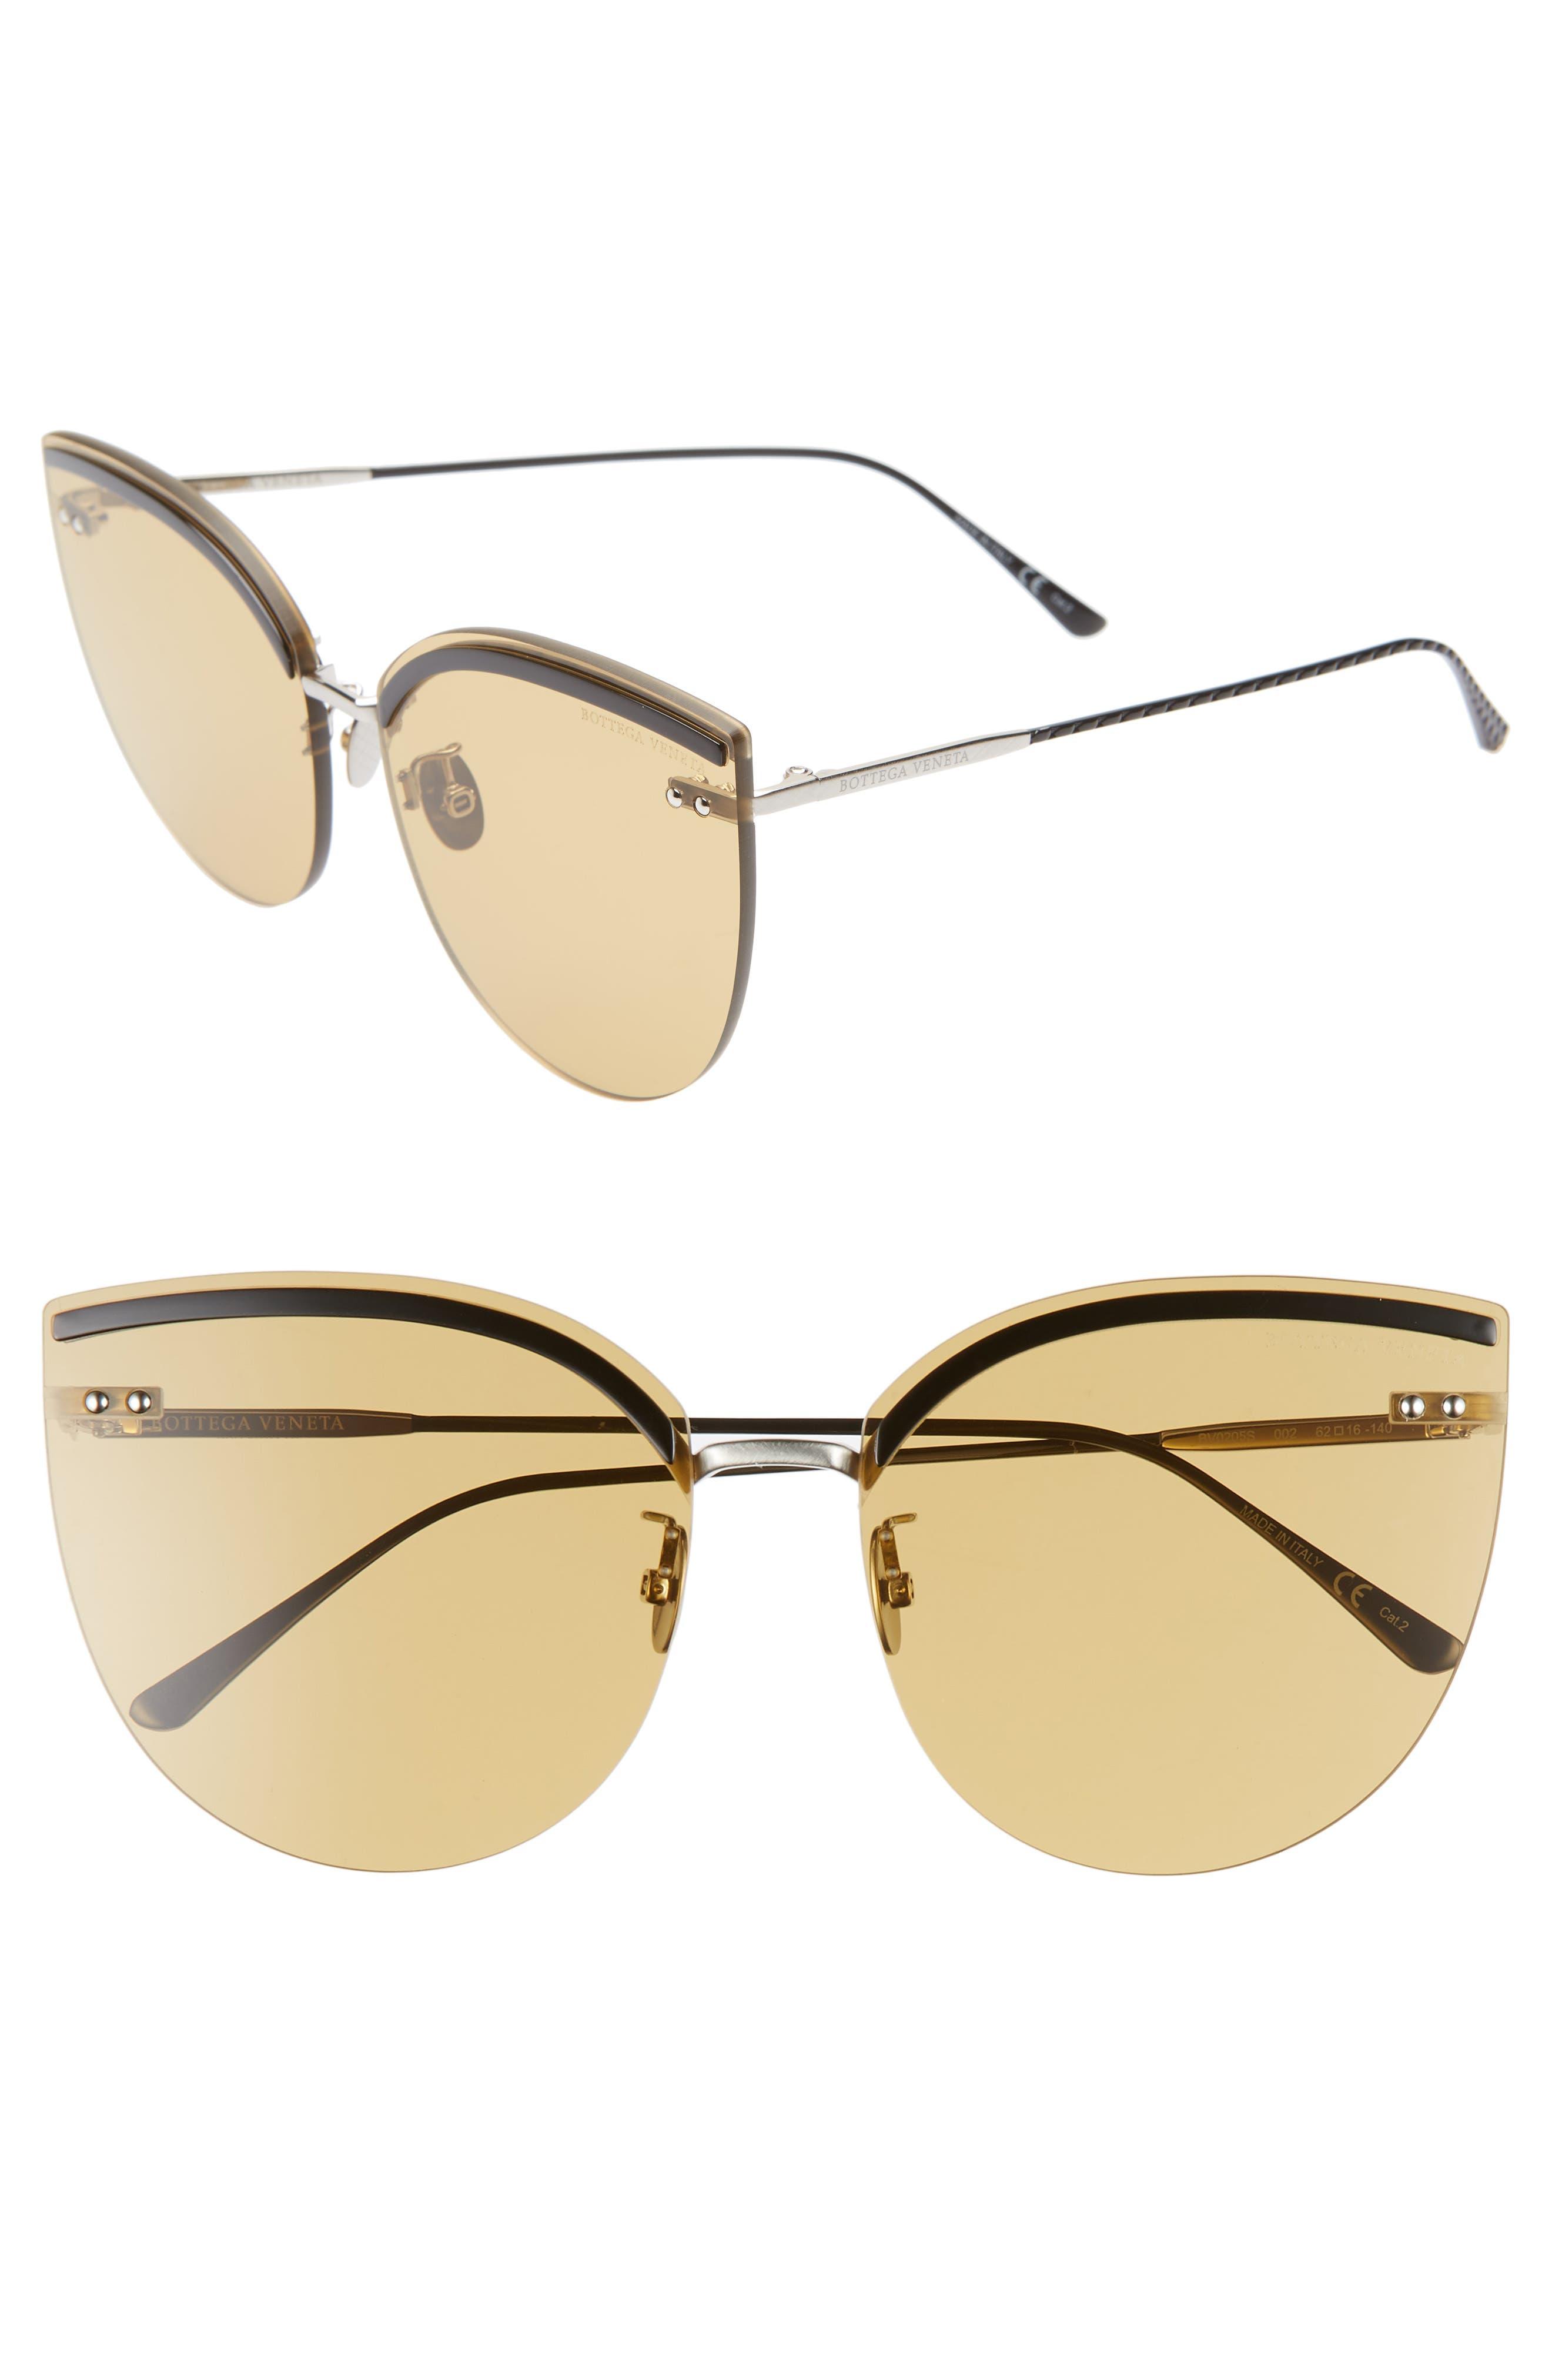 6f9f7b006b 62Mm Oversize Rimless Cat Eye Sunglasses - Silver    Black  Yellow